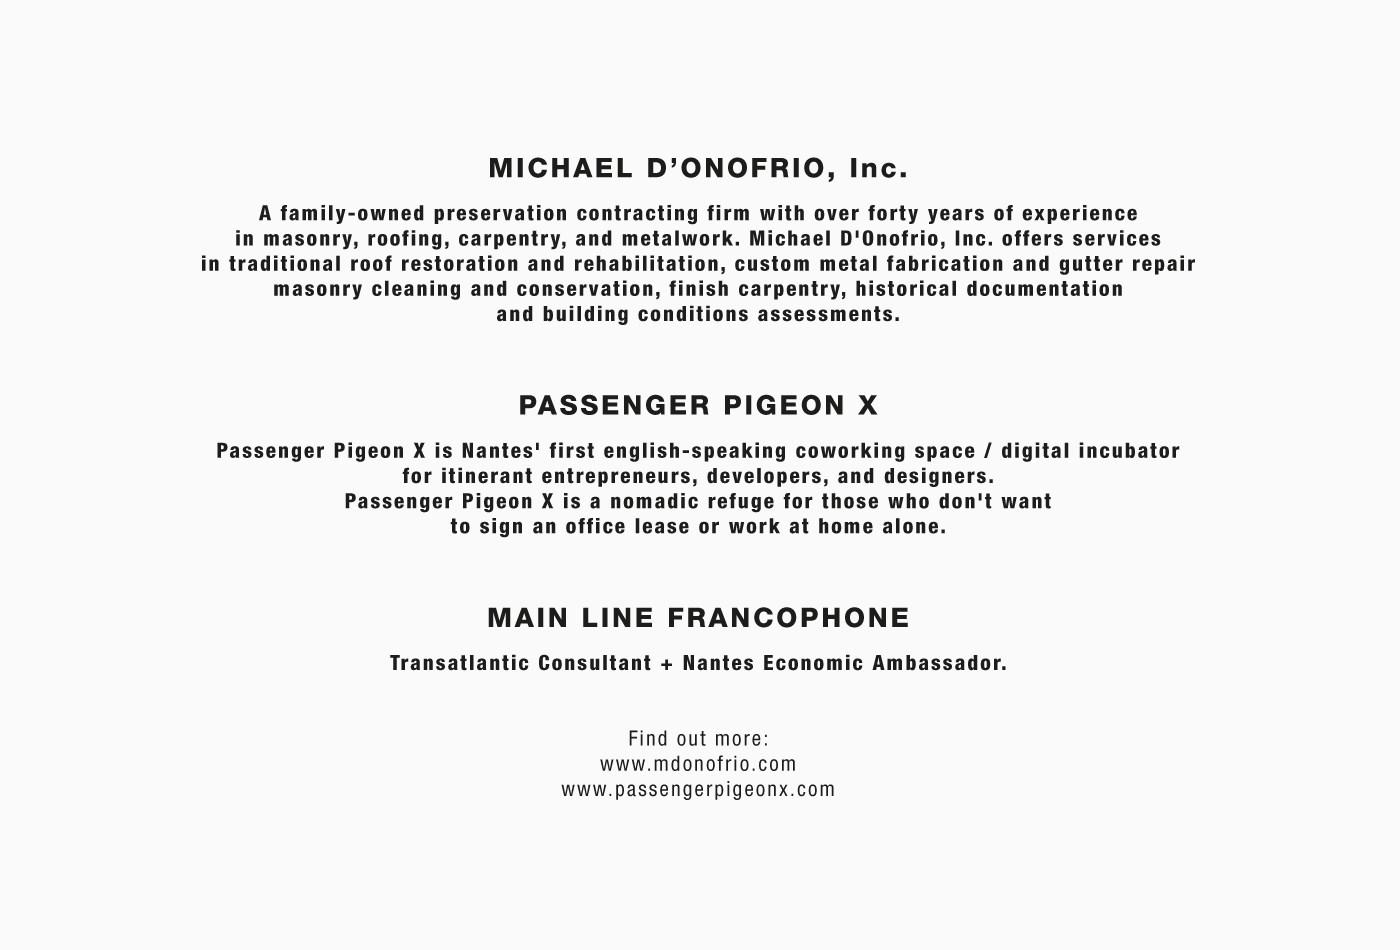 michael-d'onofrio-ppx-nantes-philadelphia-passengerpigeonx-pigeon-x-vacaliebres-branding-brand-